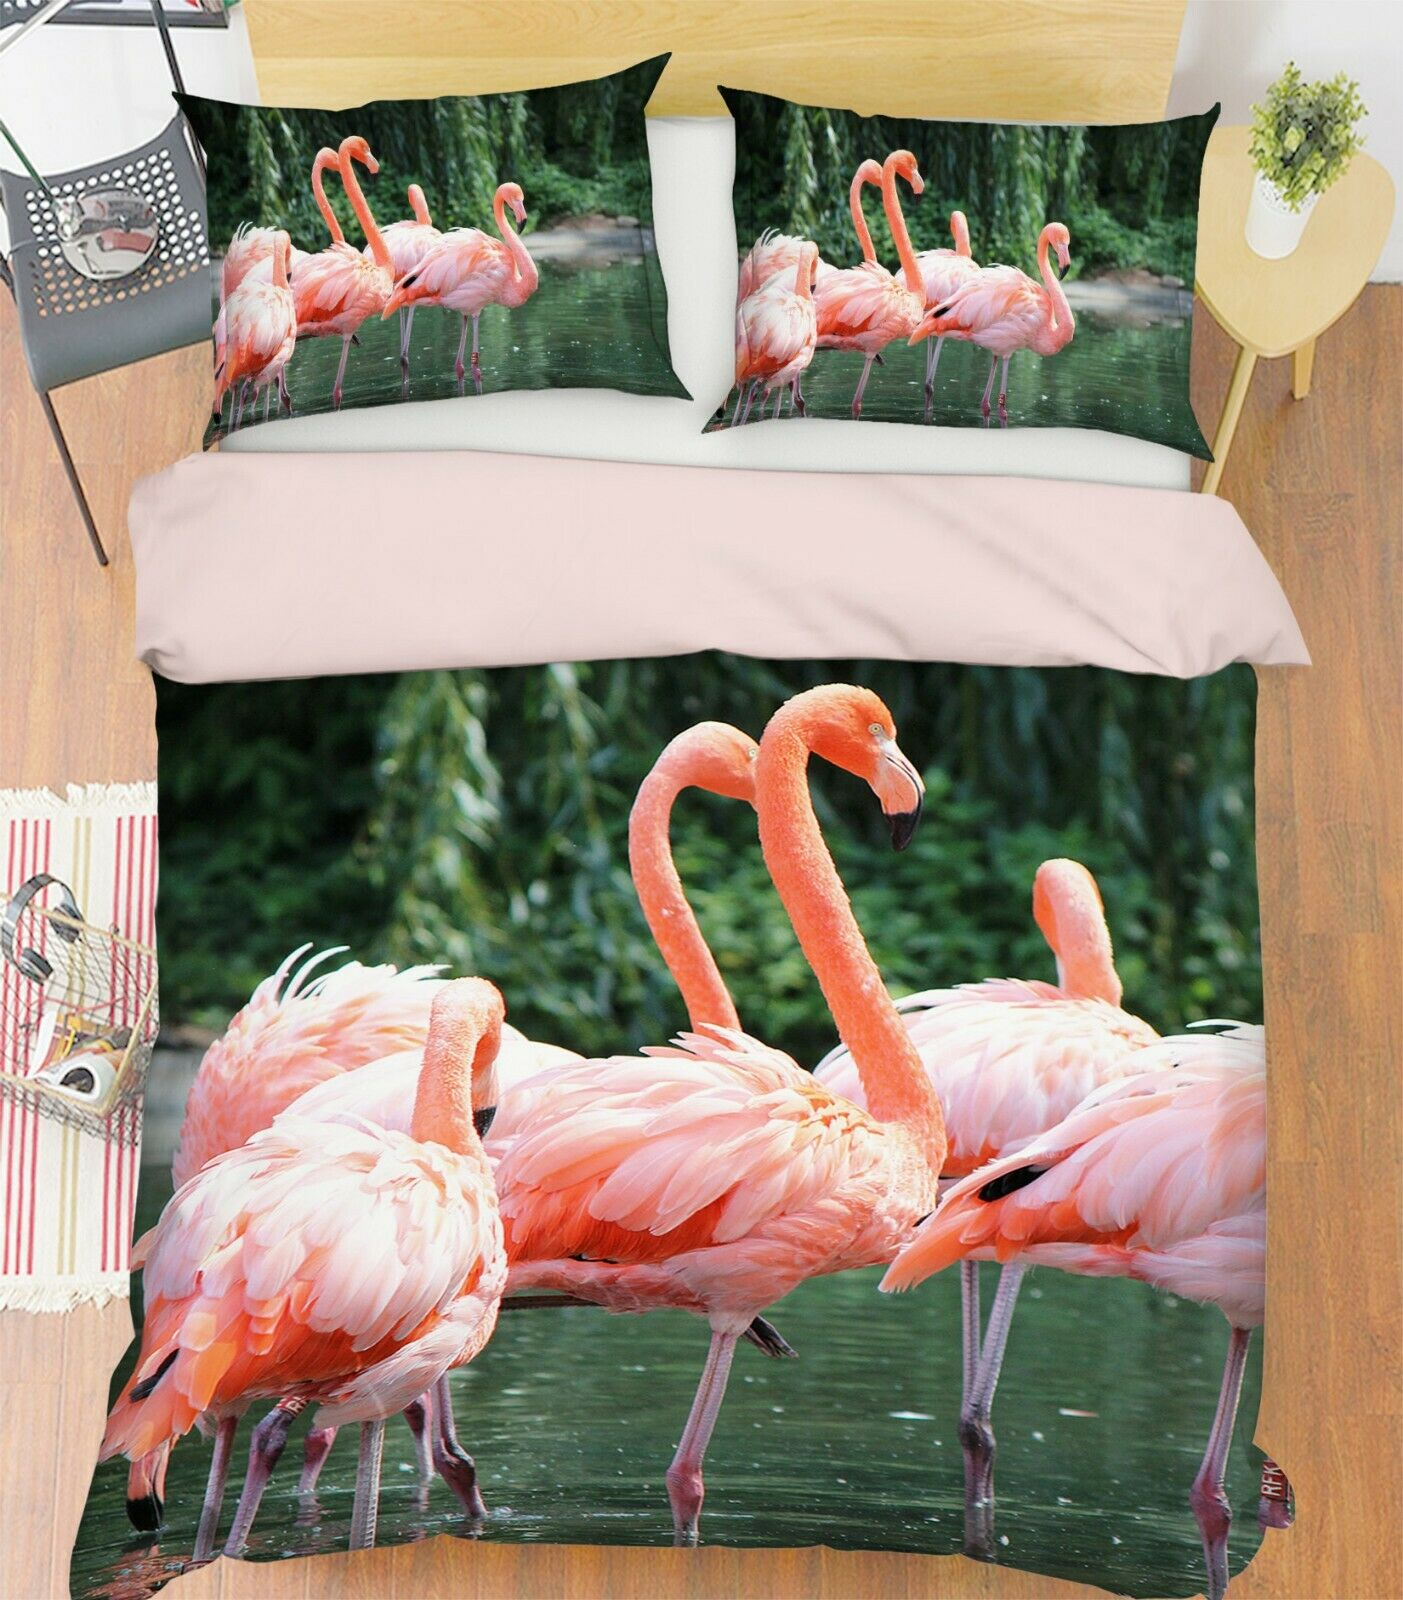 3D Flamingo River R83 Animal Bed Pillowcases Quilt Duvet Cover Queen King Zoe